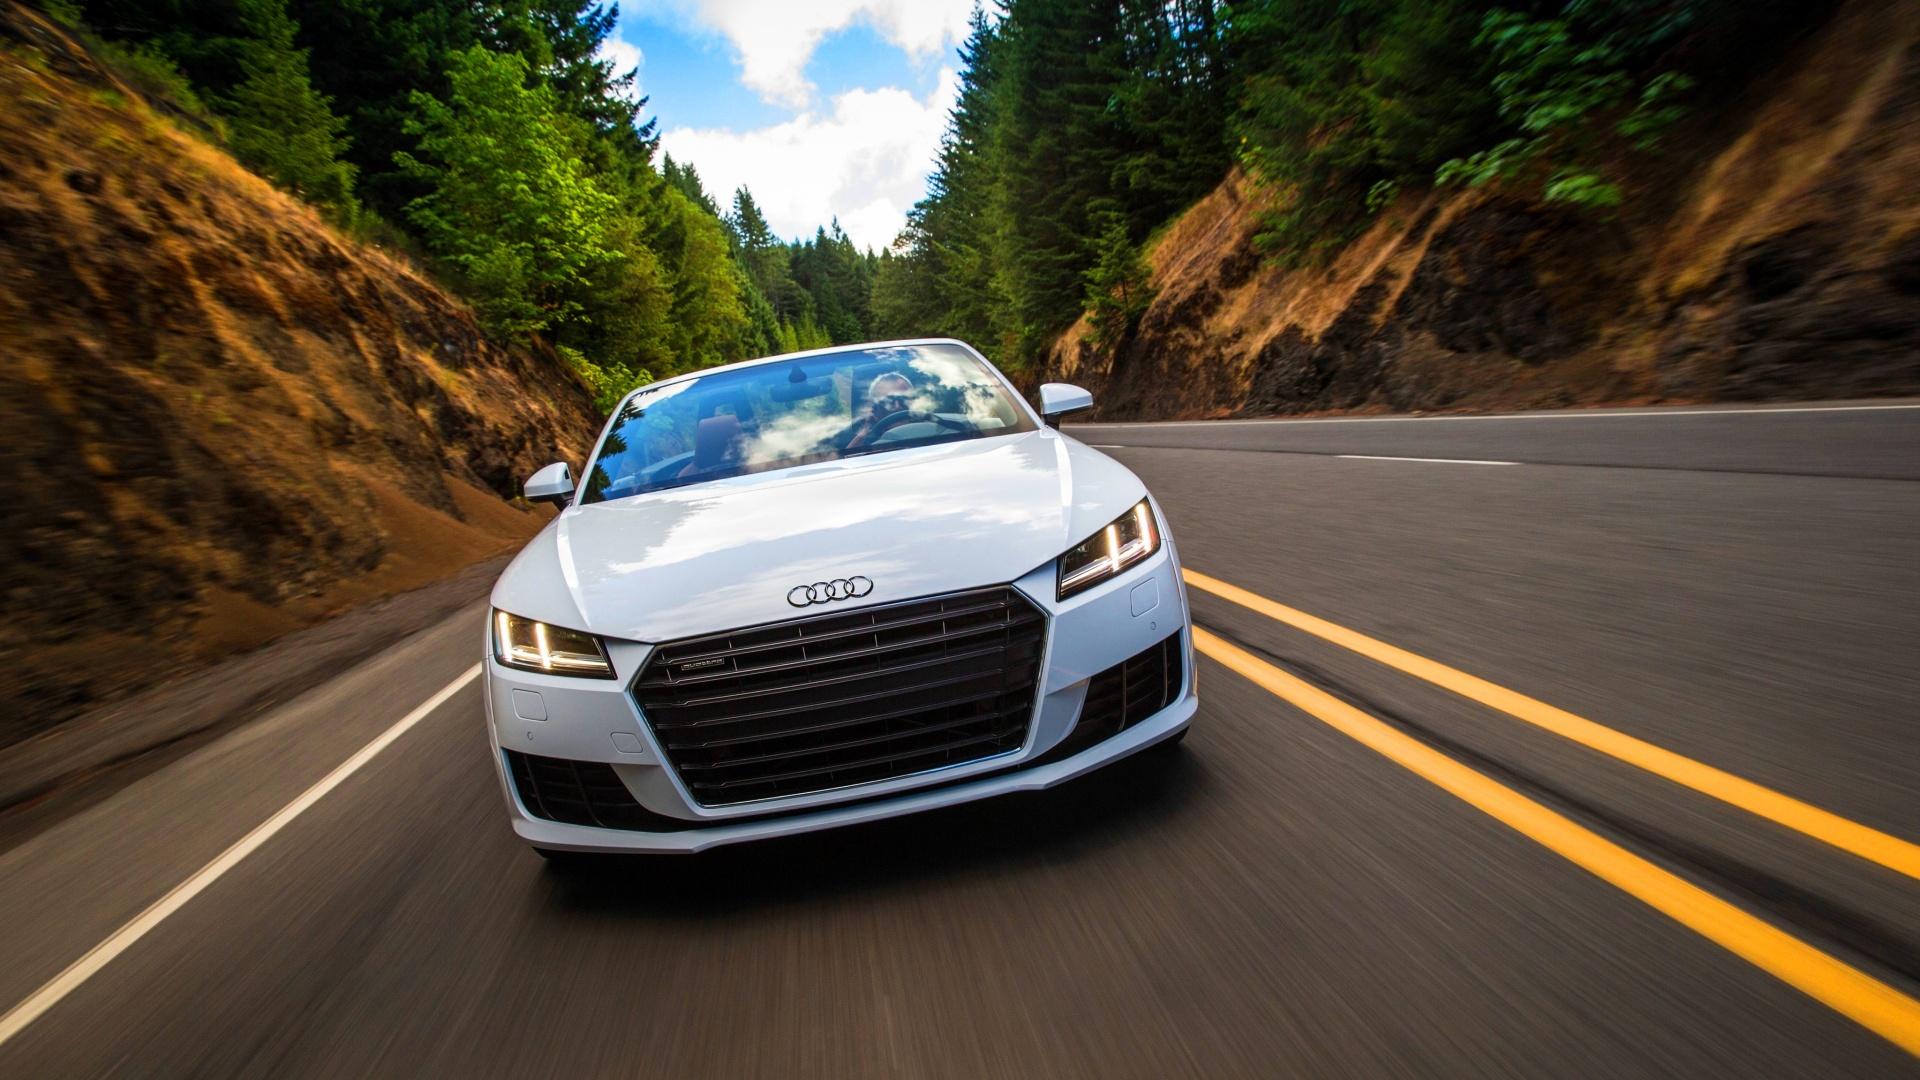 Audi Tt First Drive 2016 Wallpapers 1920x1080 683725